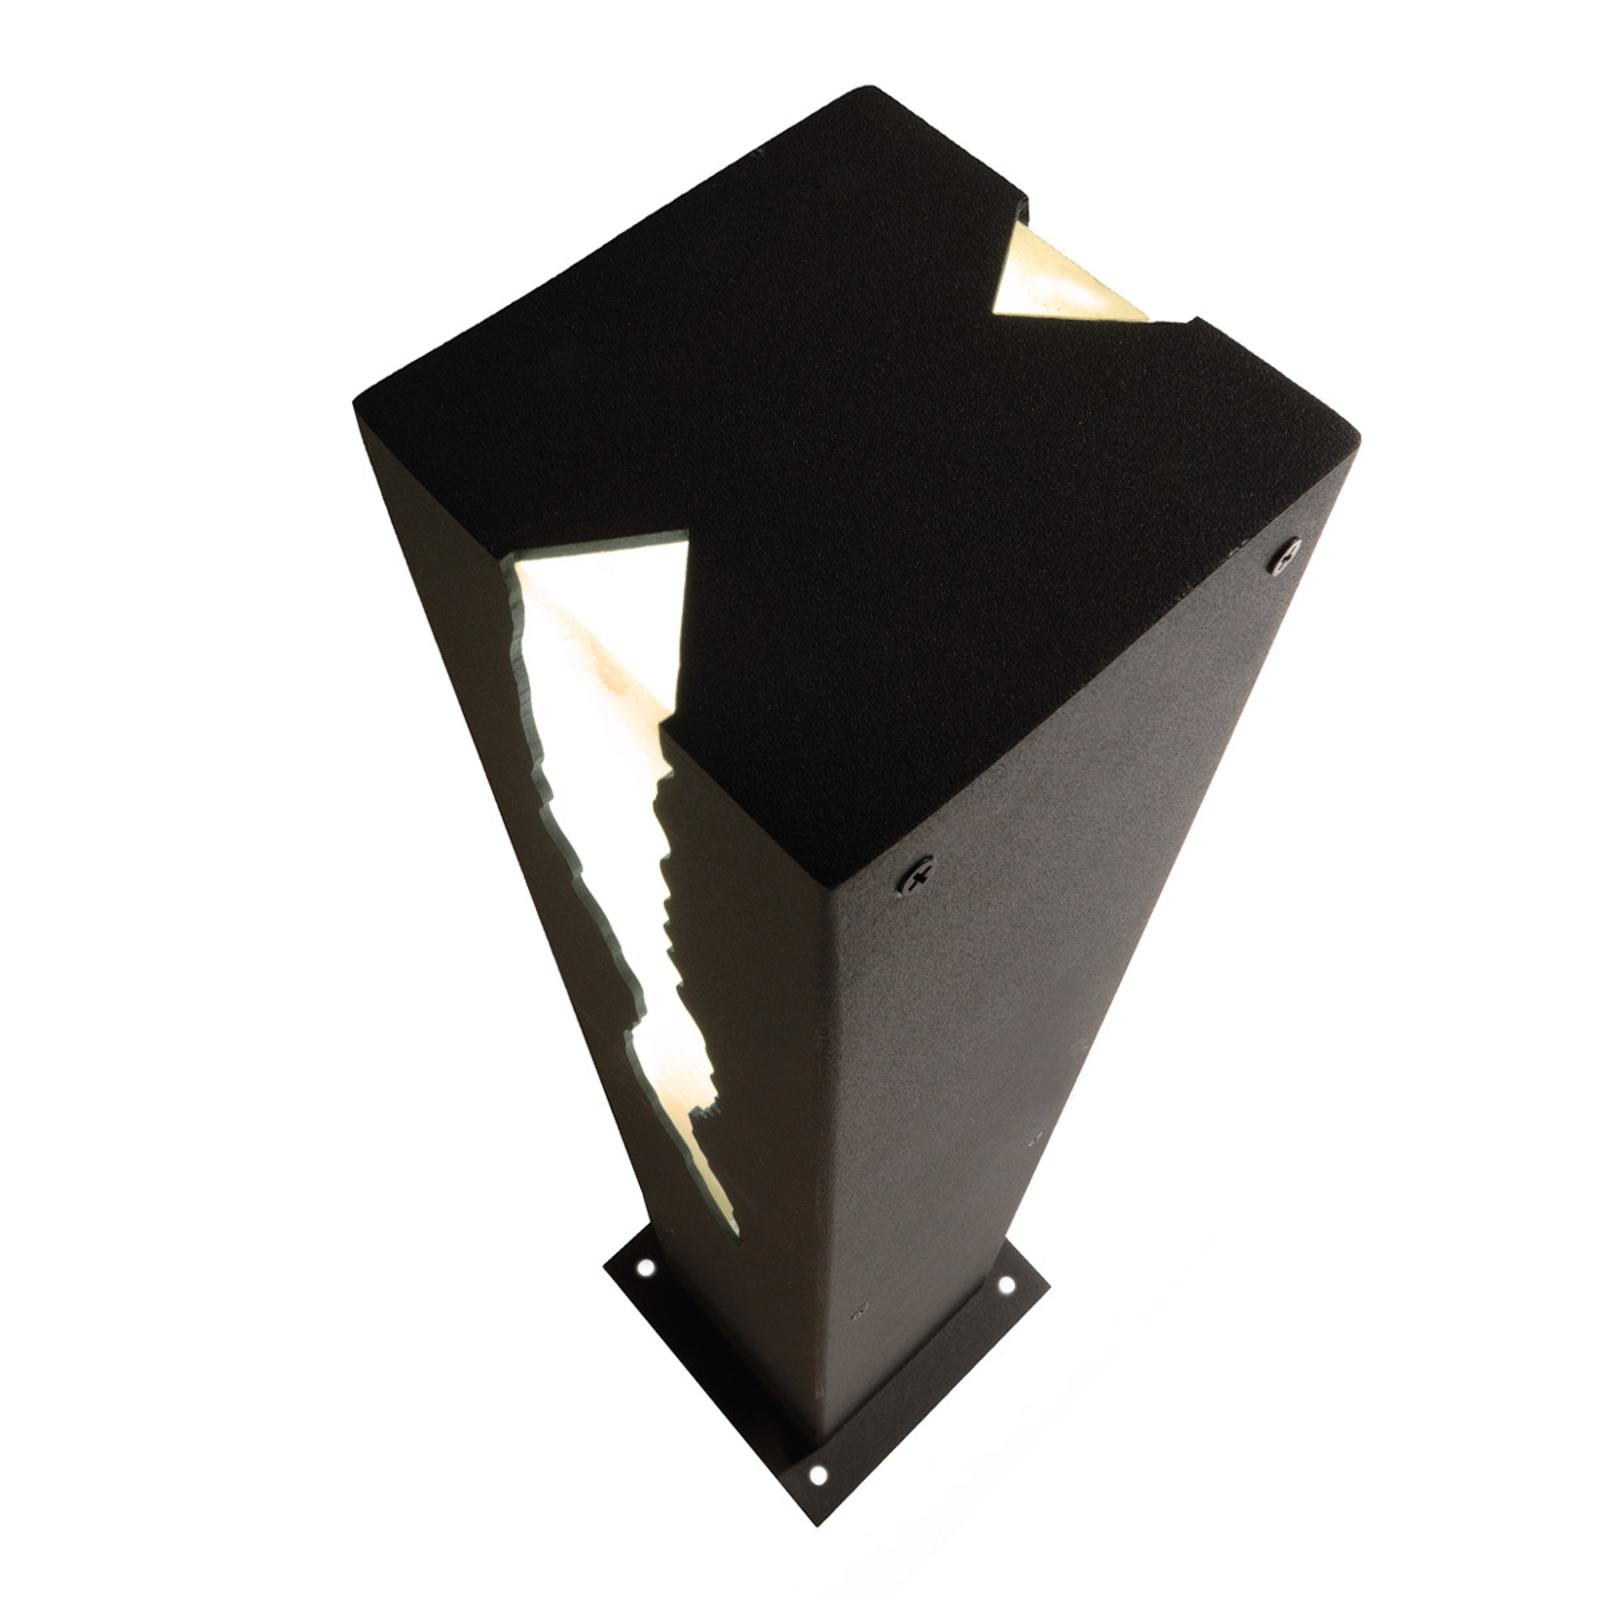 Soklové LED svietidlo El Rayo dvojstranný výstup